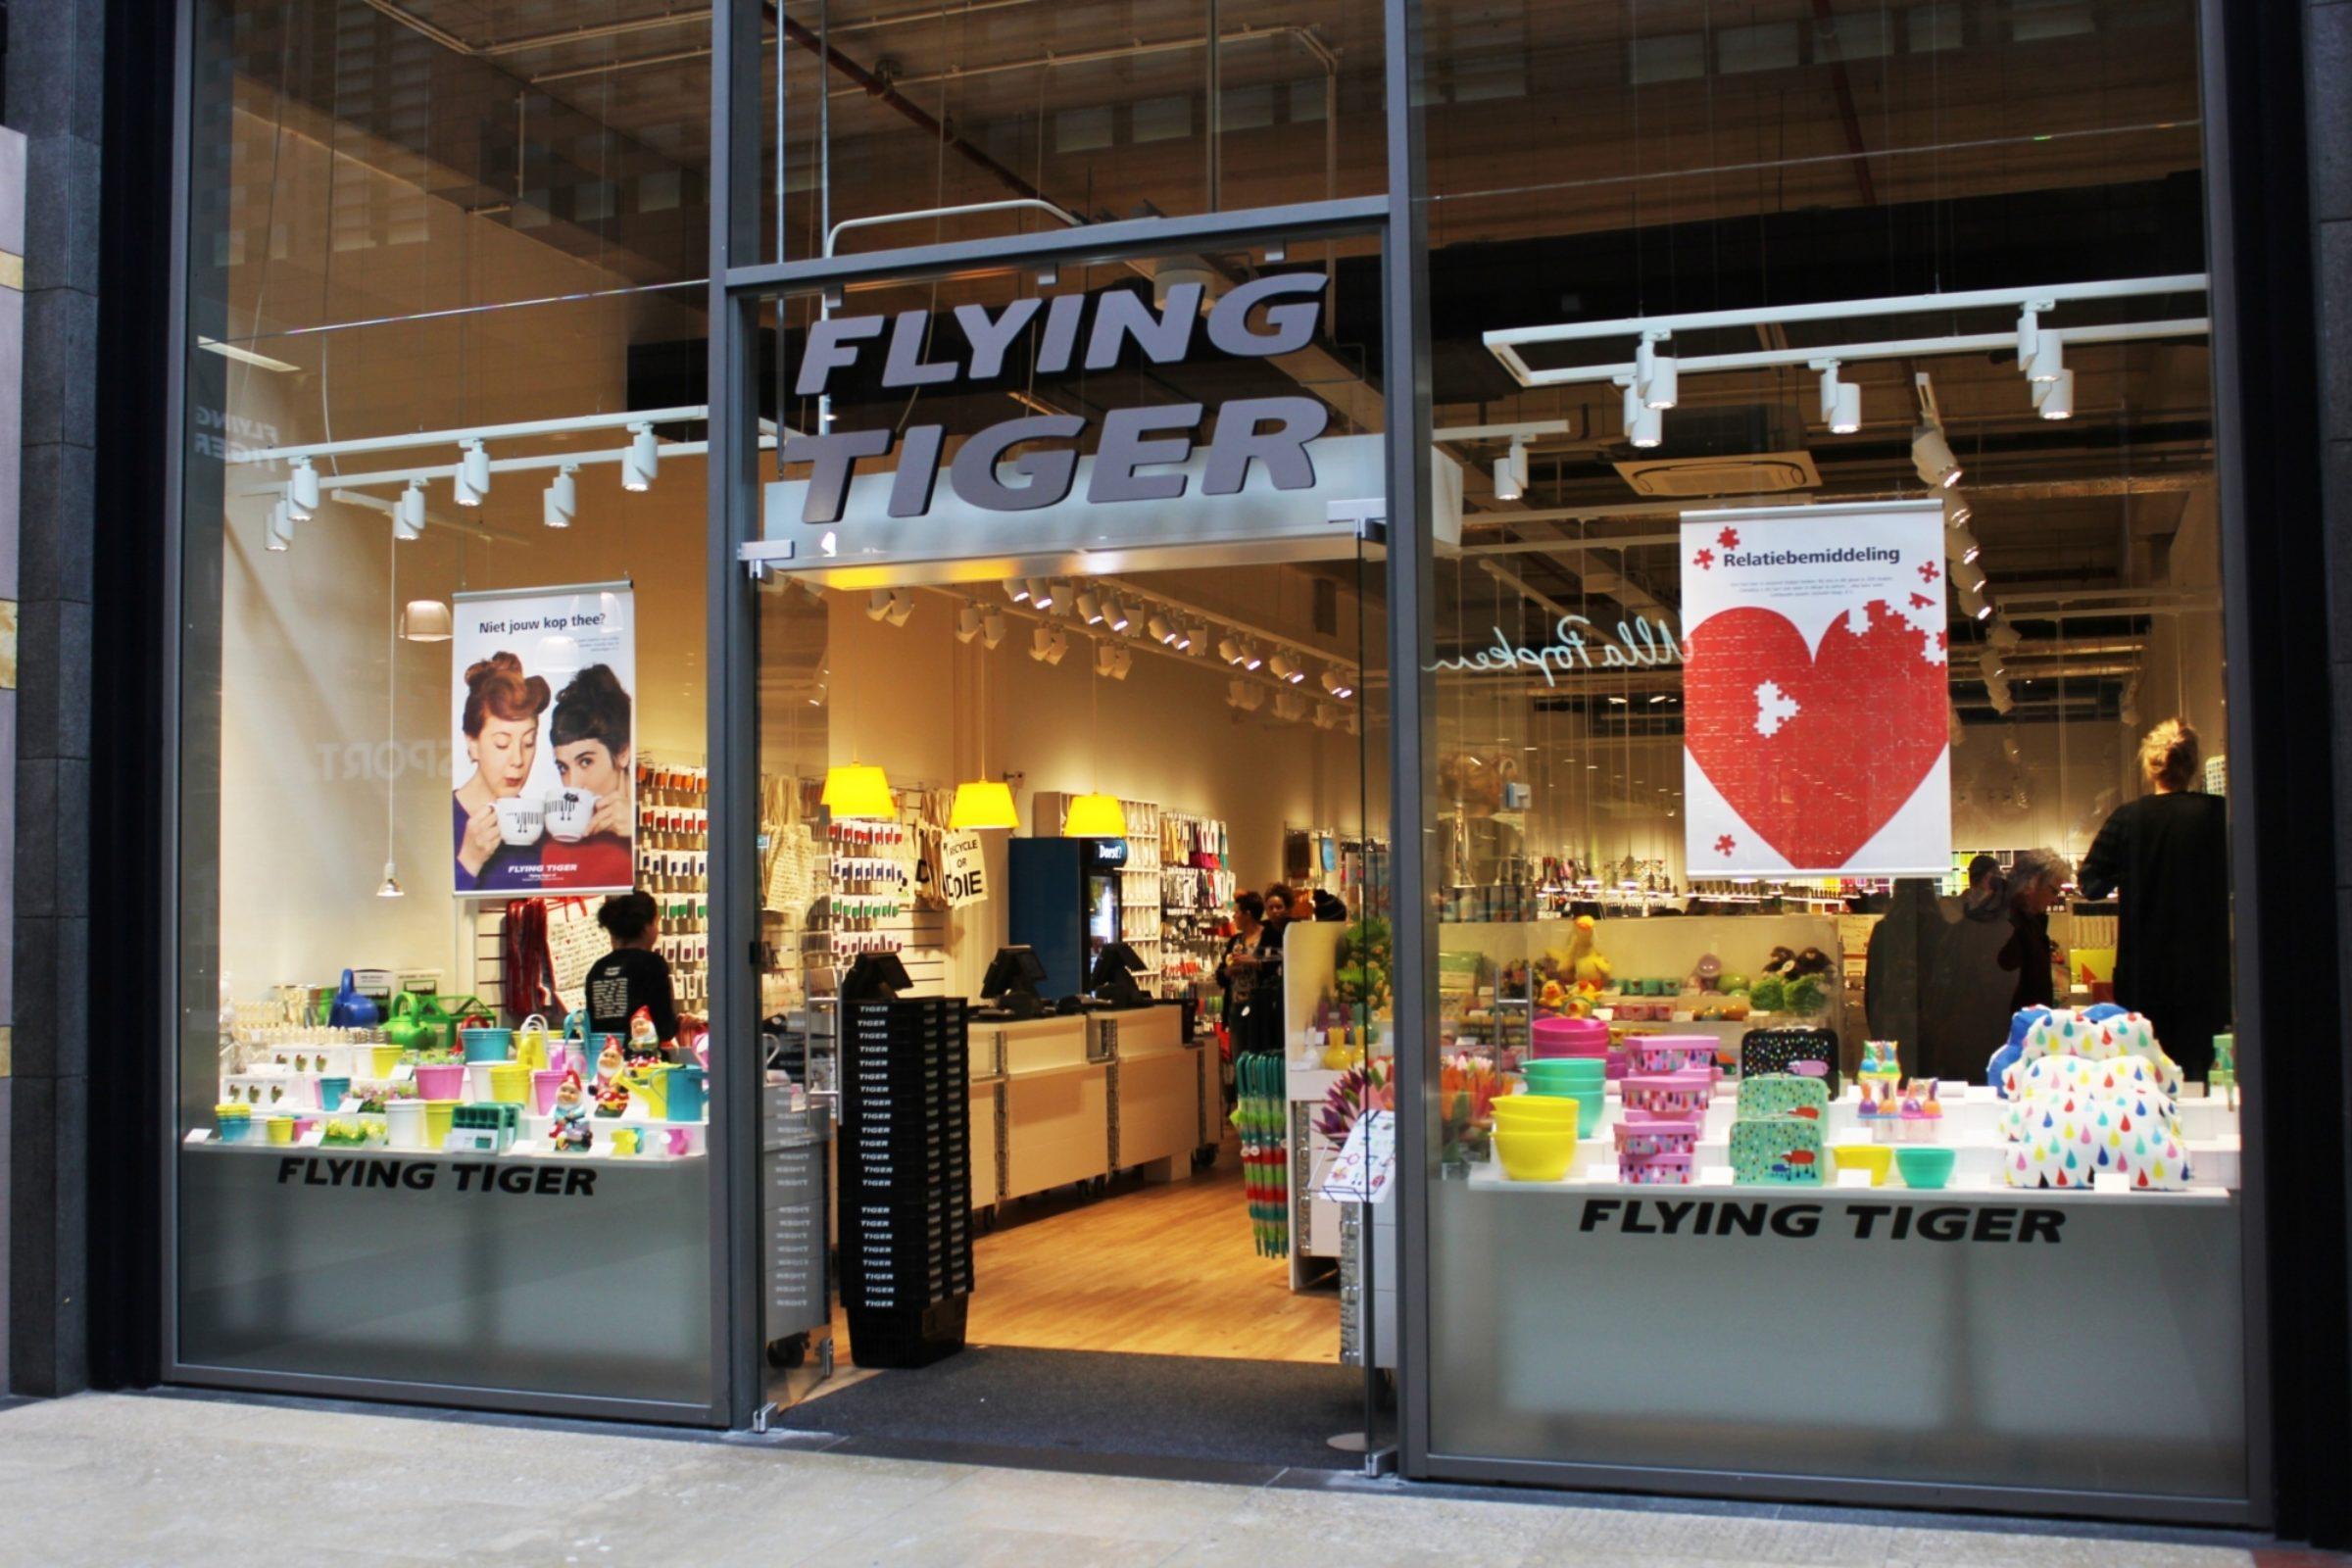 Flying  Tiger3  Leonne Kersten